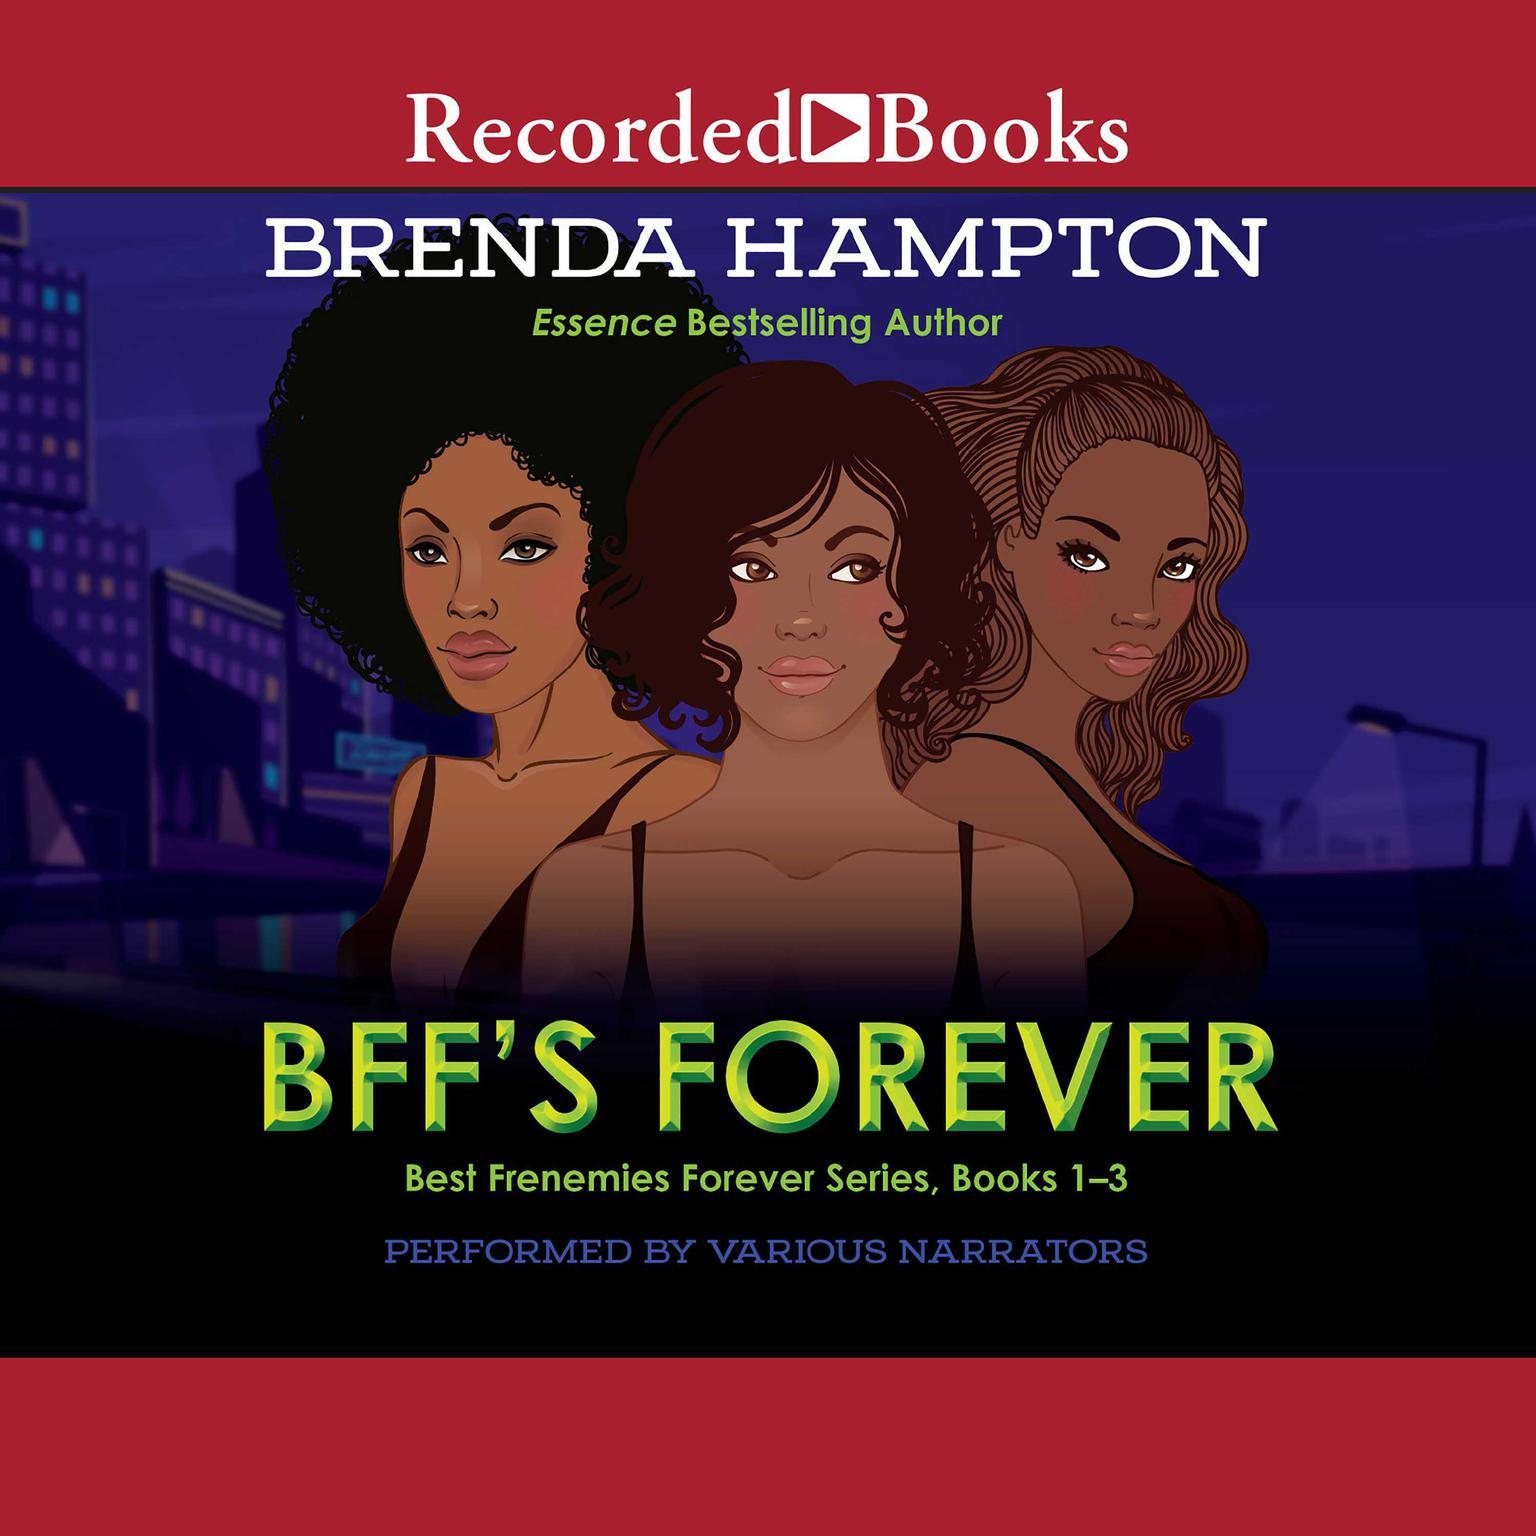 BFFs Forever: Best Frenemies Forever Series, Books 1-3 Audiobook, by Brenda Hampton